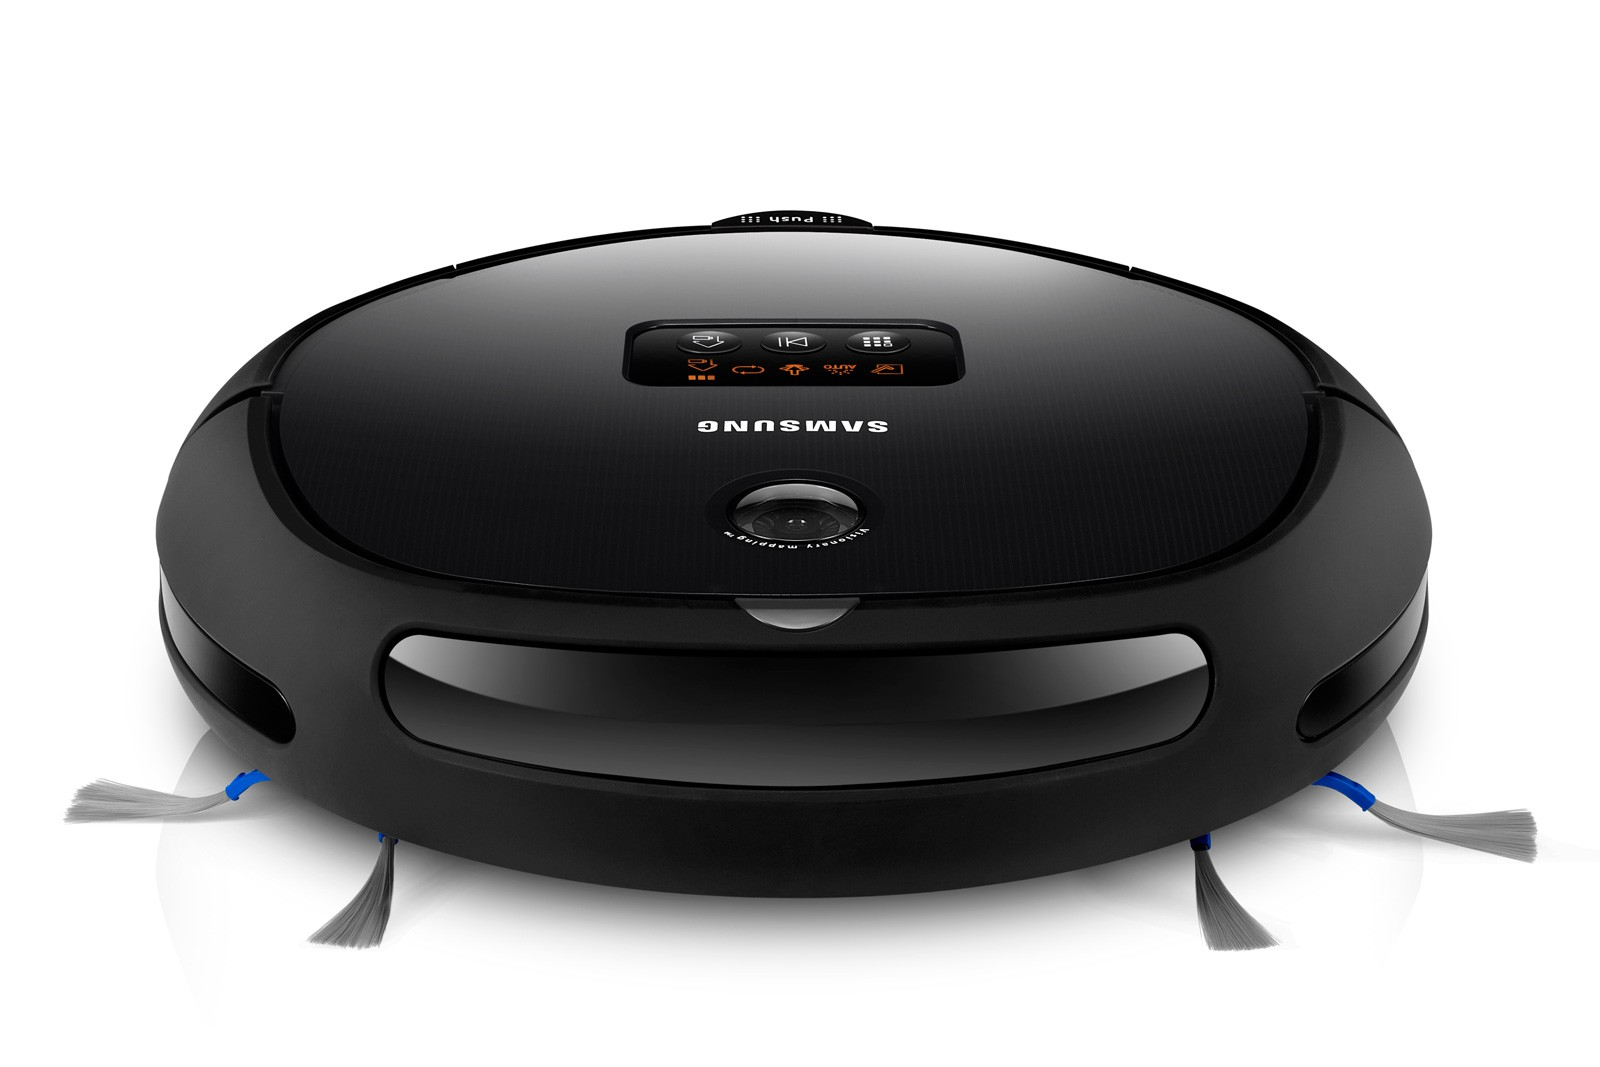 Aspirateur Robot Samsung